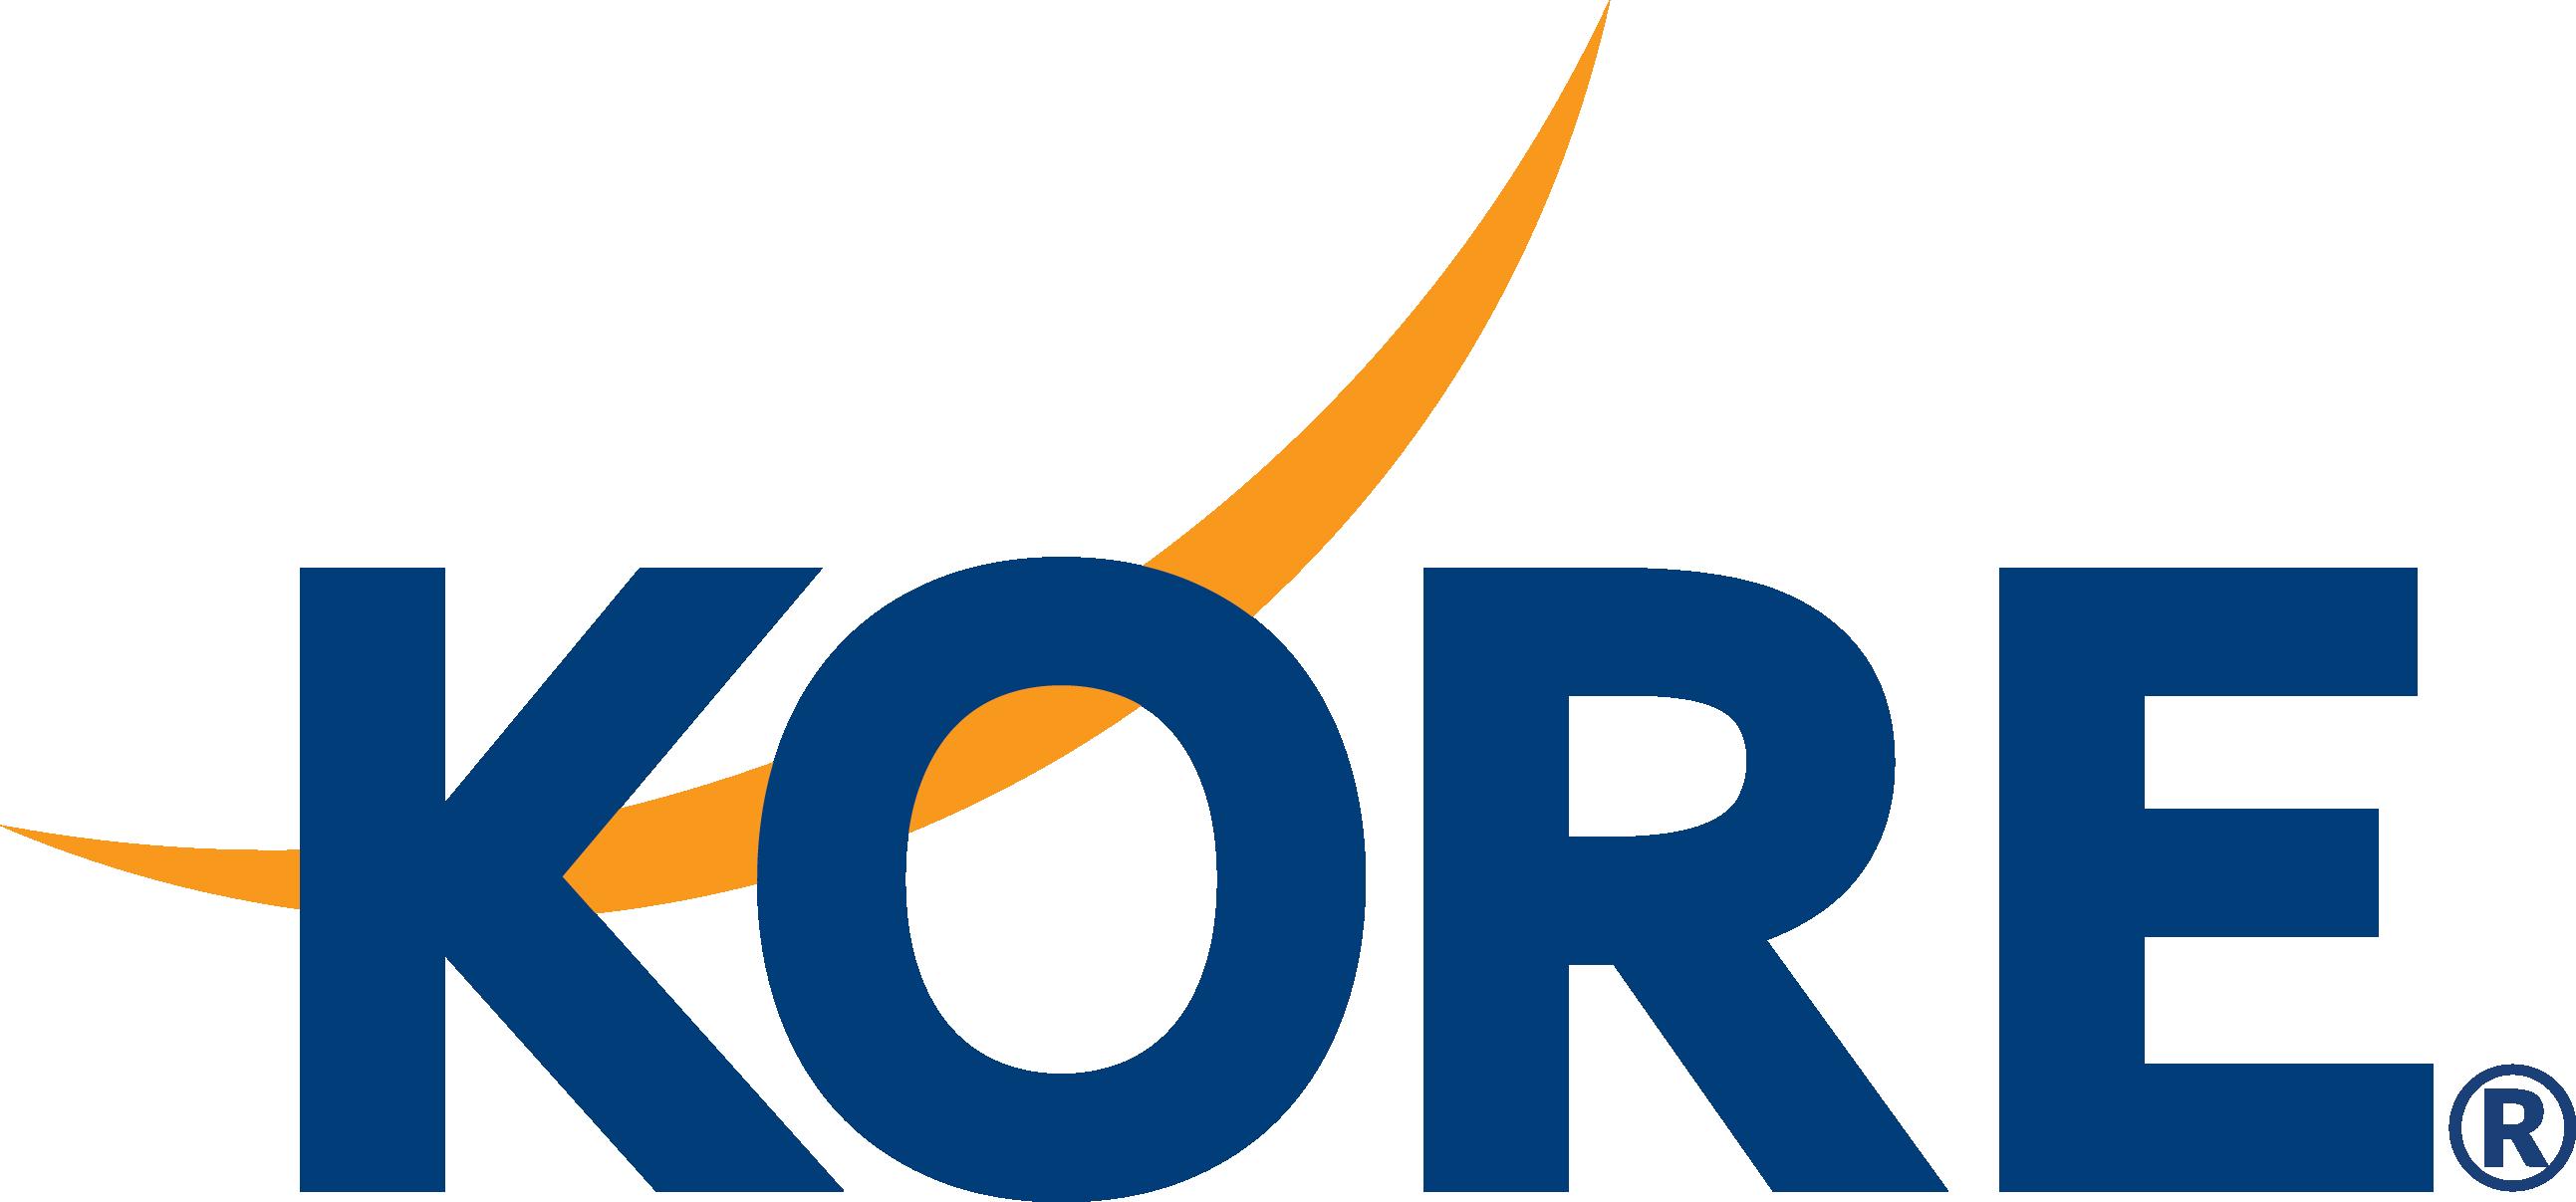 2016 KORE r Logo